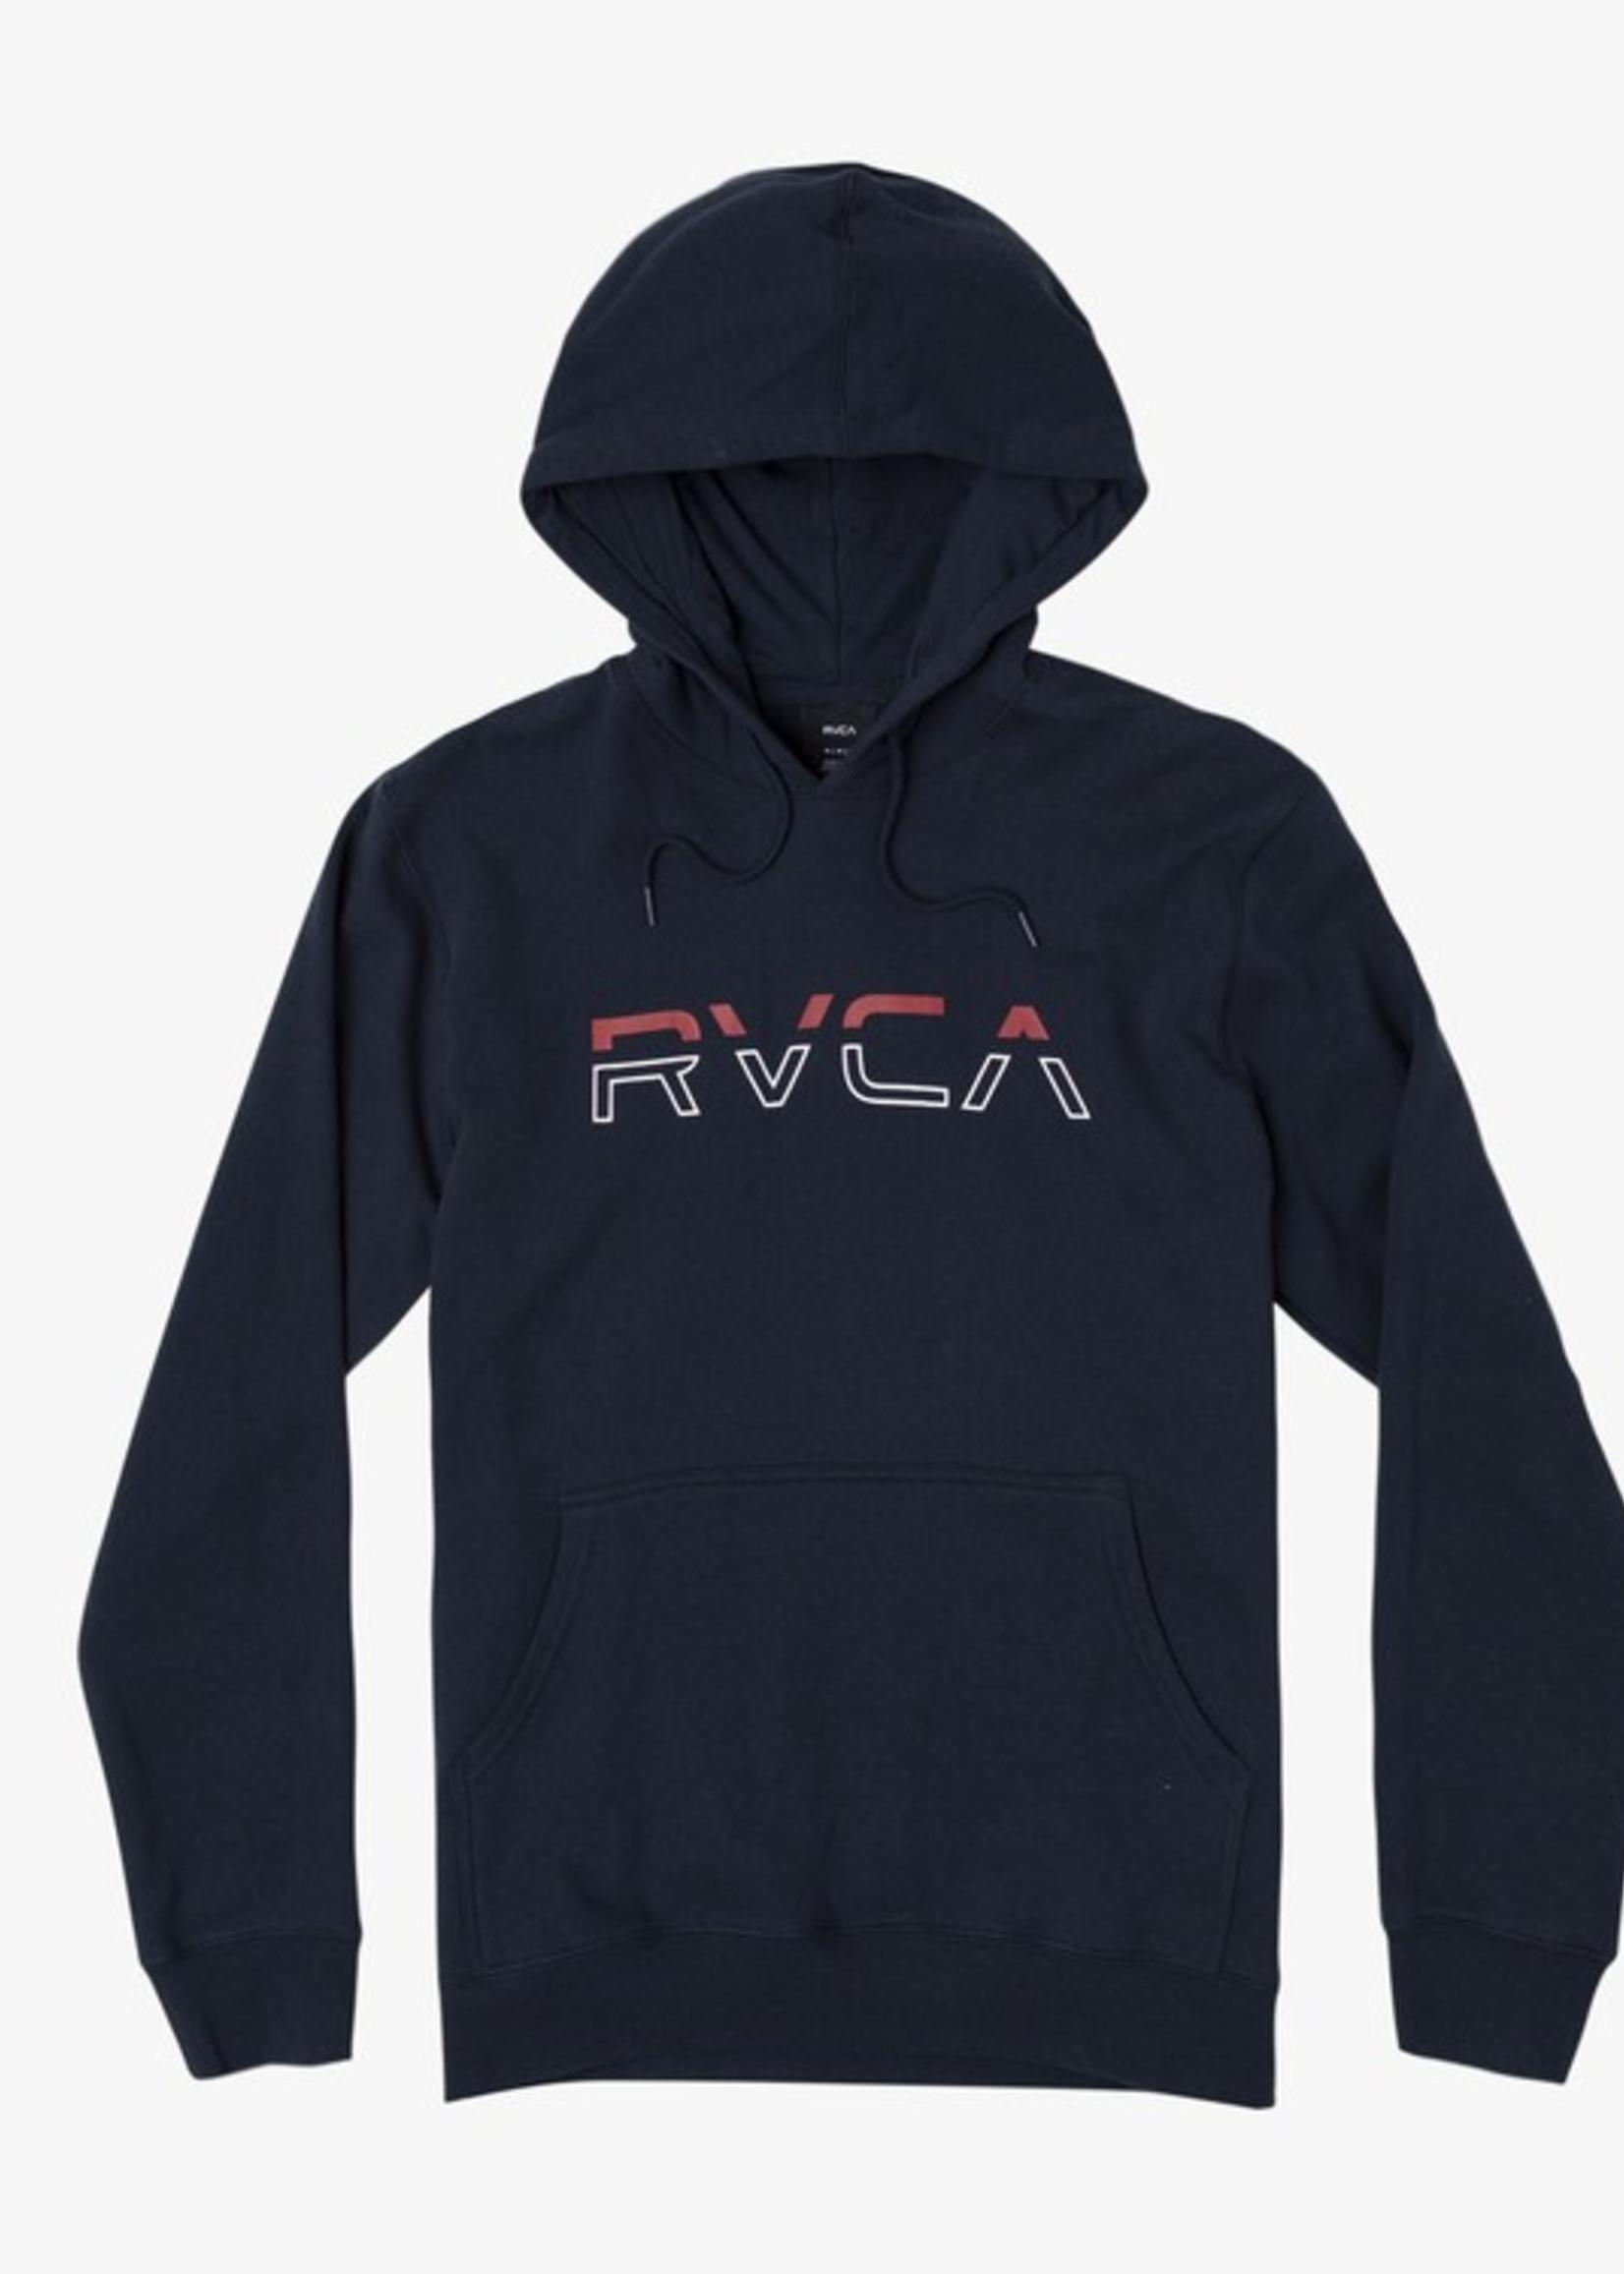 RVCA Split Pin Hoodie - Navy